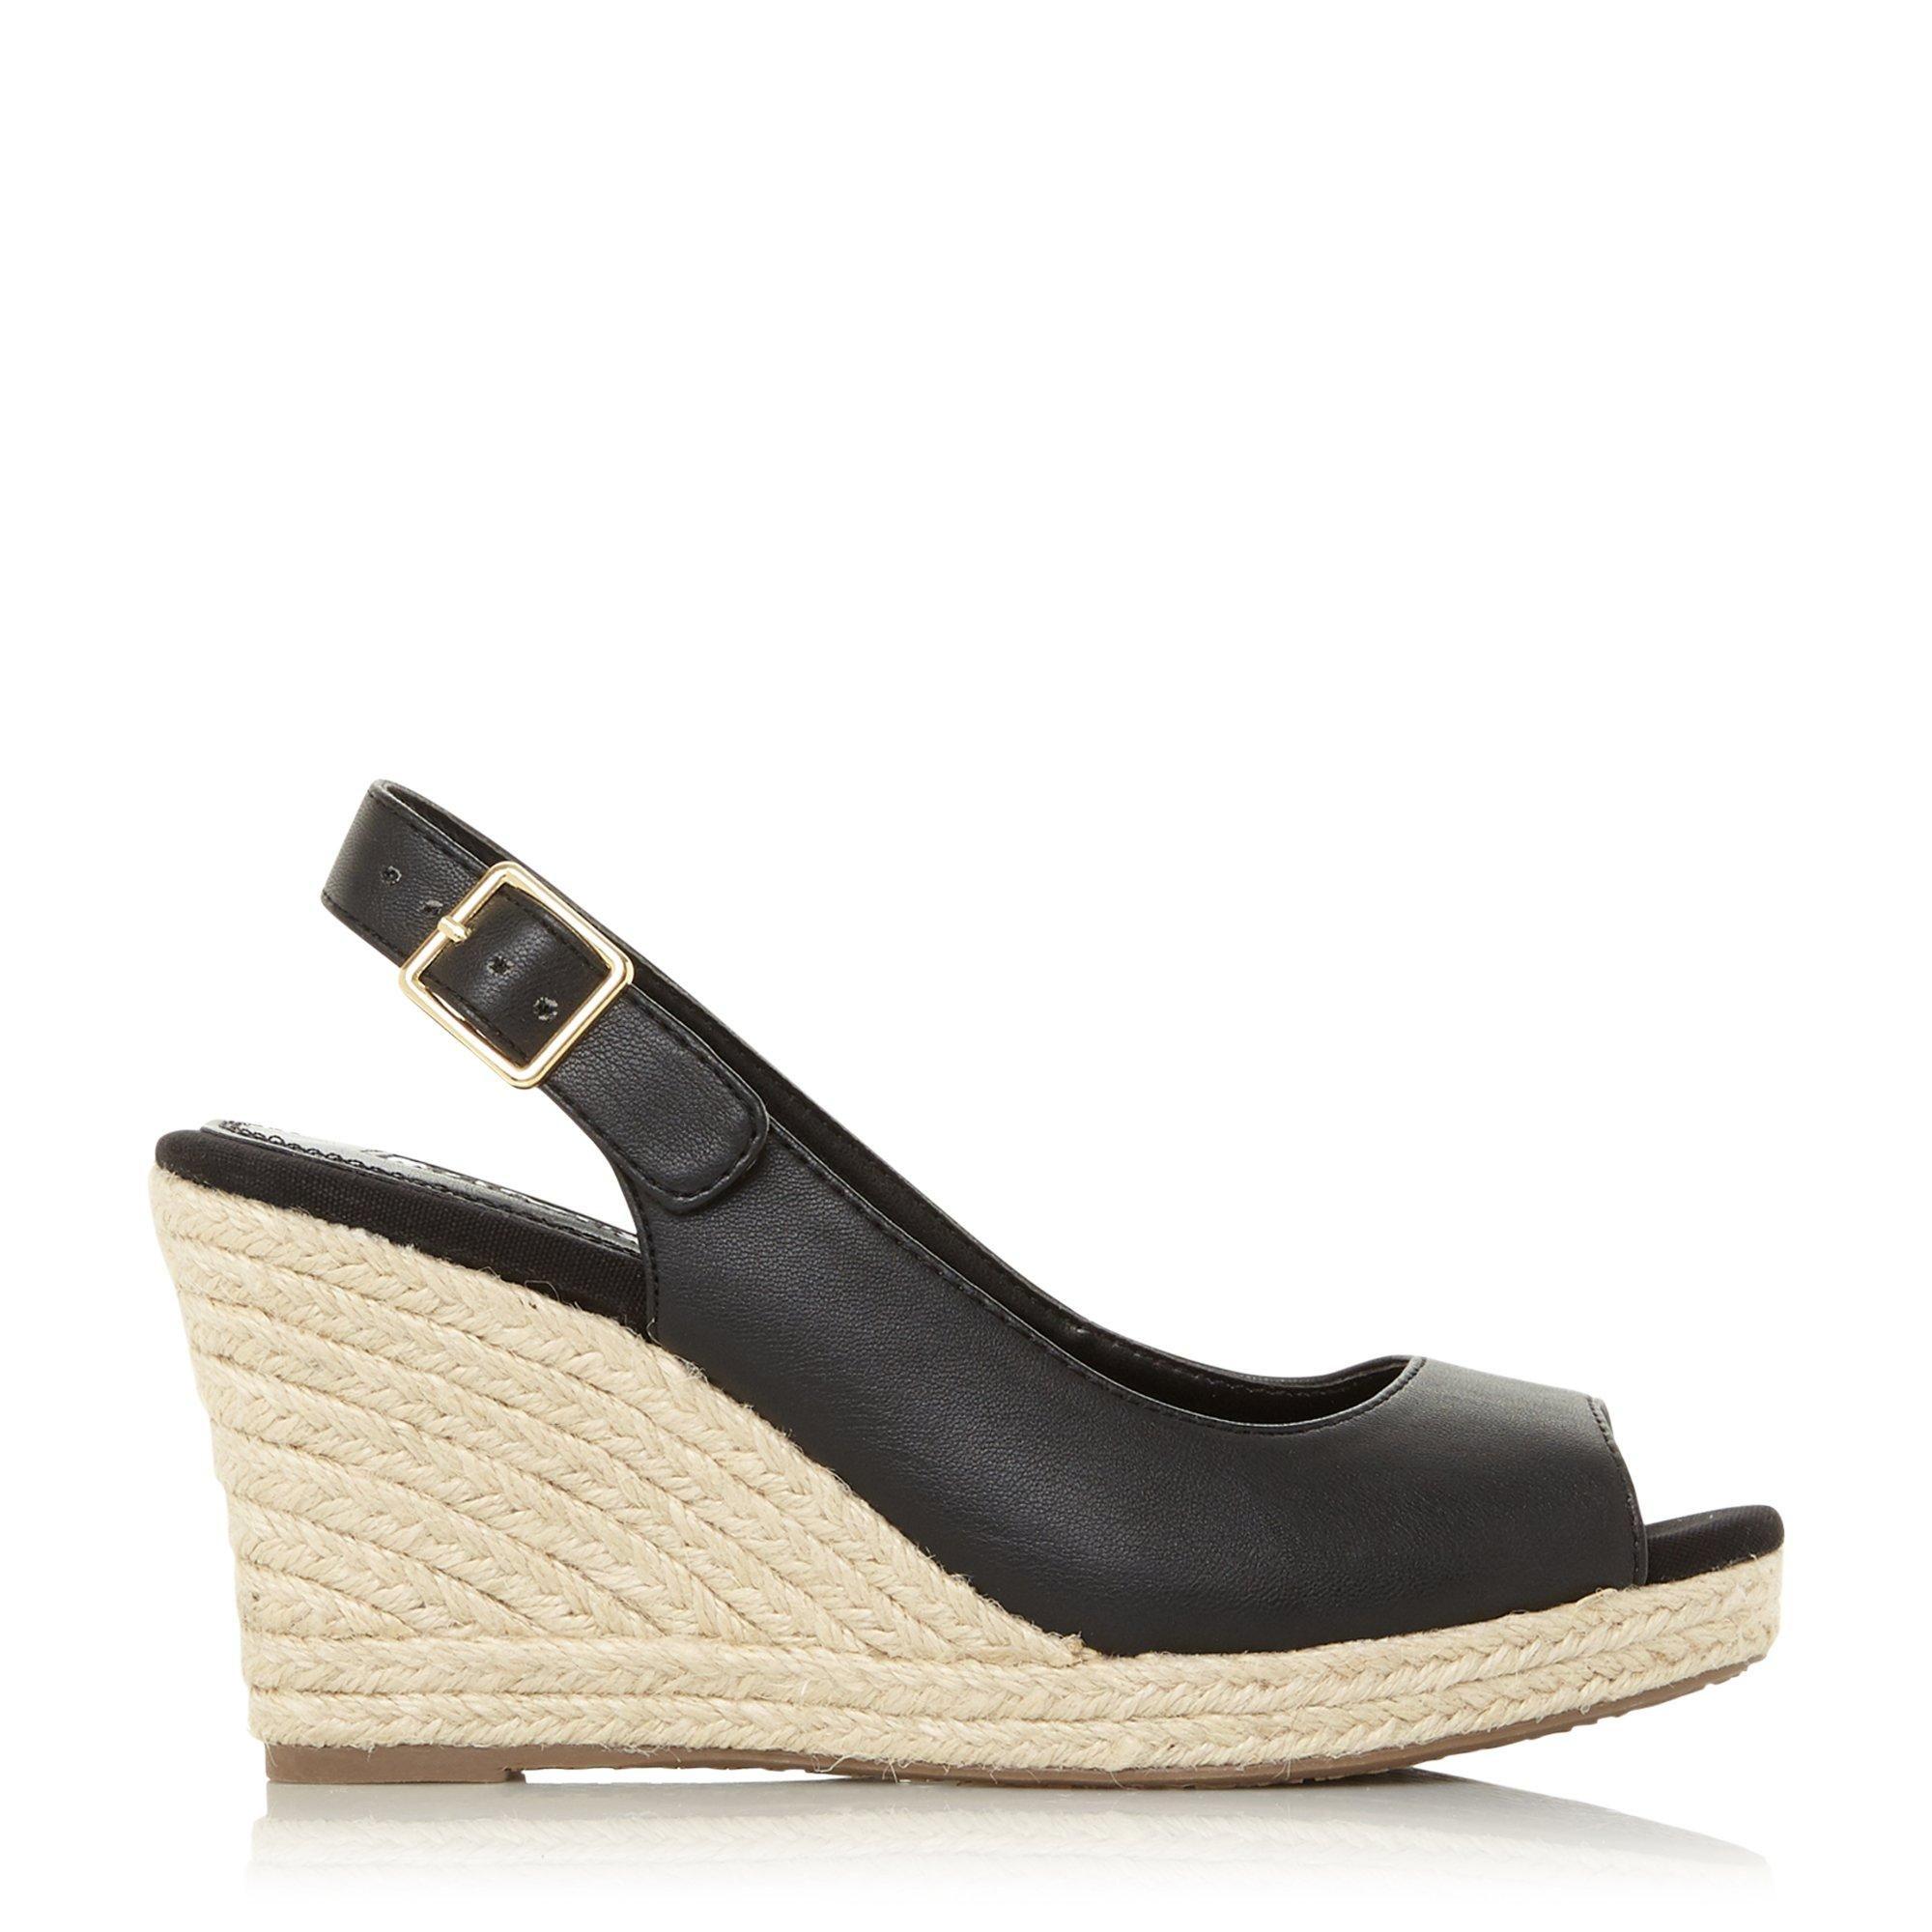 Dune Ladies KICKA Slingback Espadrille Wedge Sandals